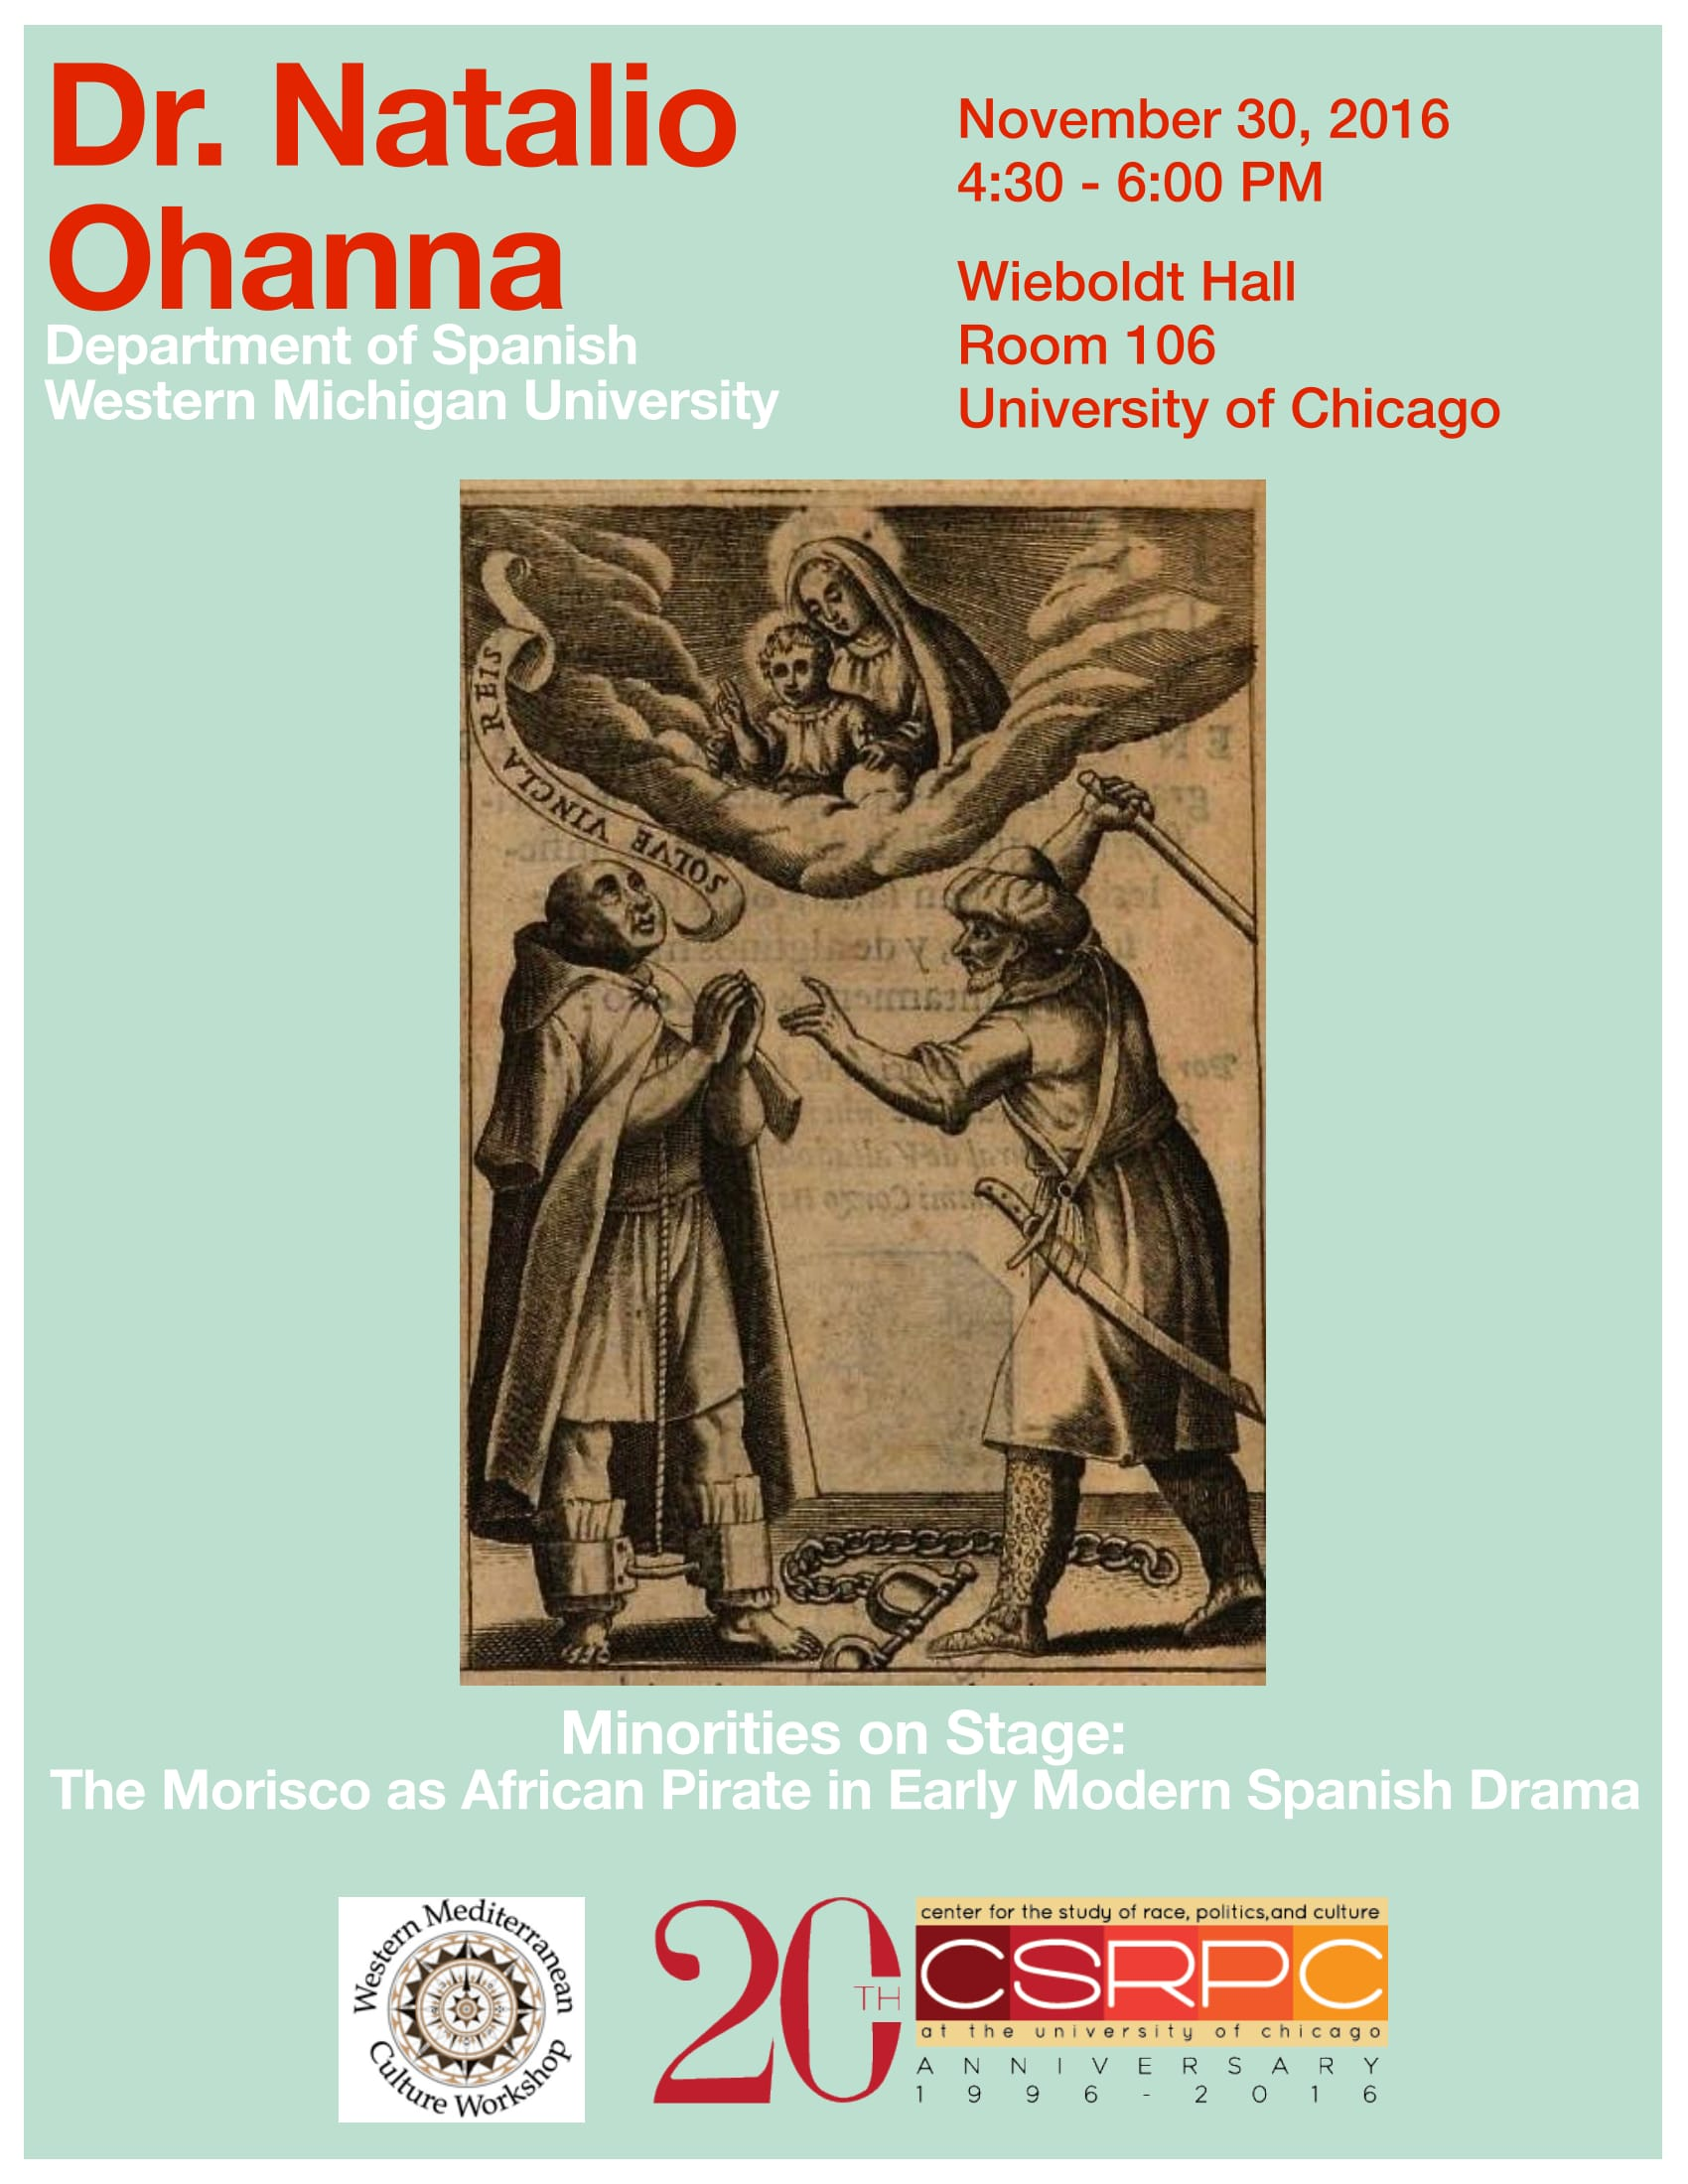 natalio-ohanna-poster-1